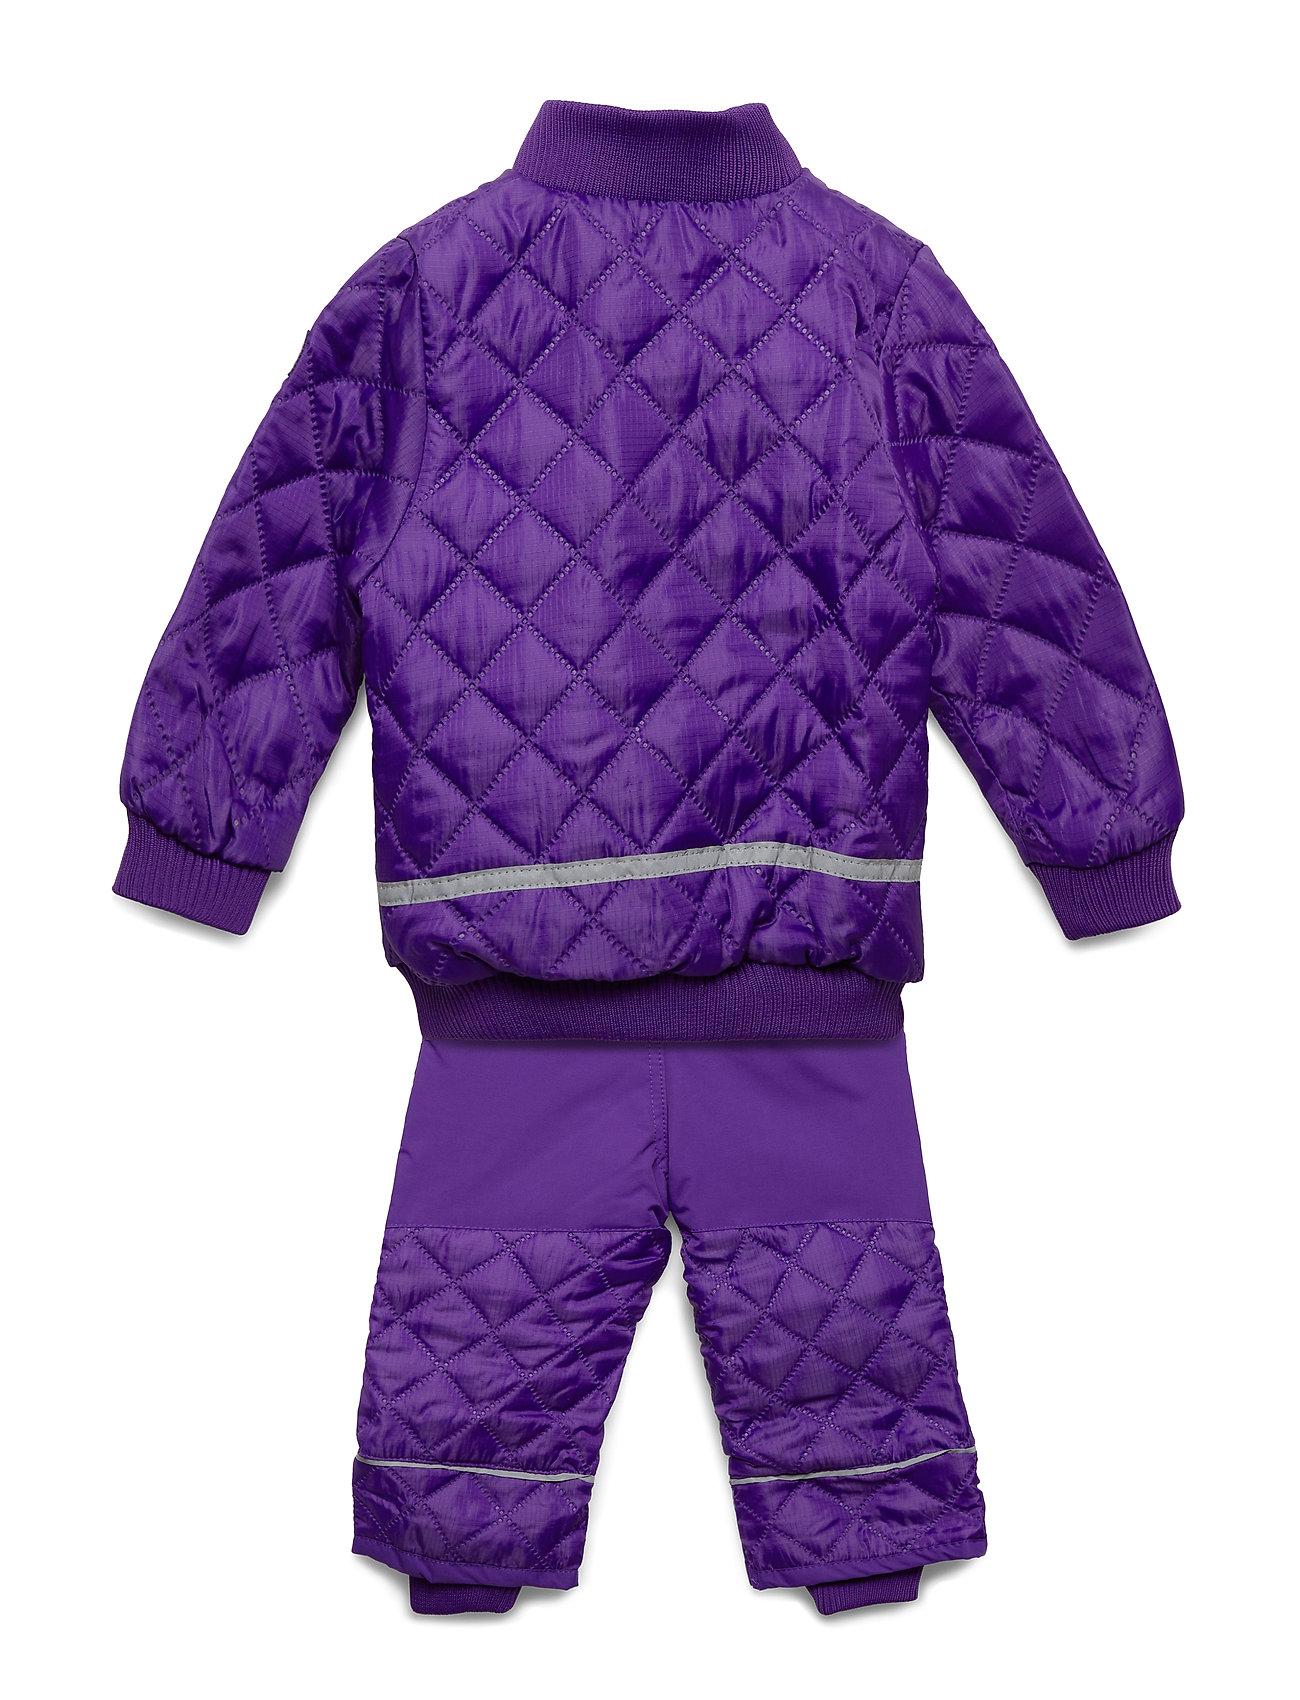 Mikk-Line Termo set w. fleece in jacket - 741/DARK VIOLET (REDDISH)